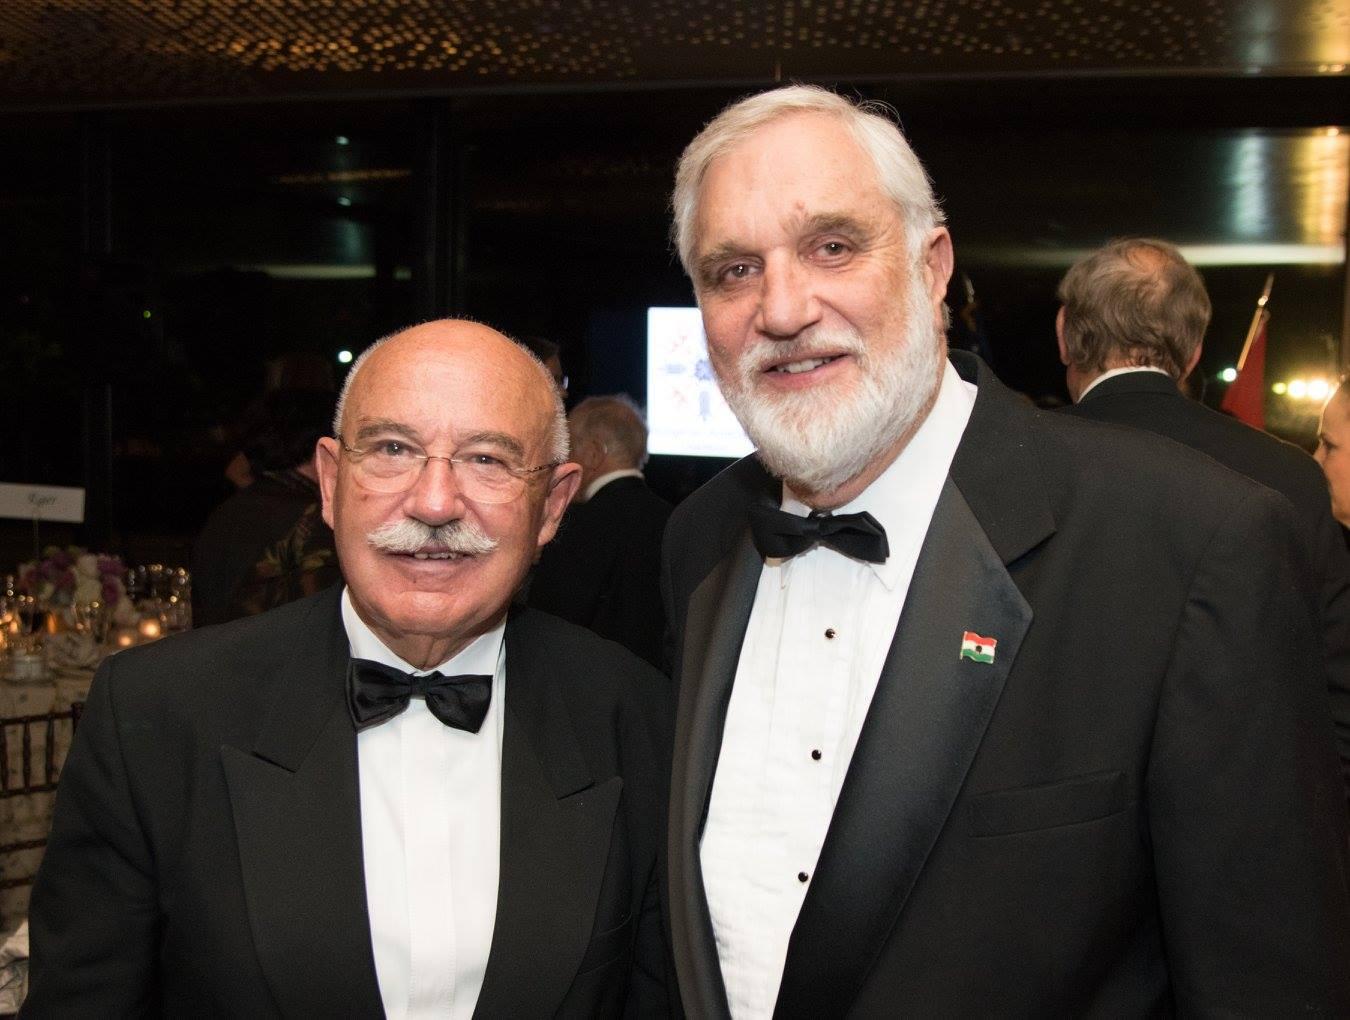 Dr. János Martonyi, Mr. George Pogan